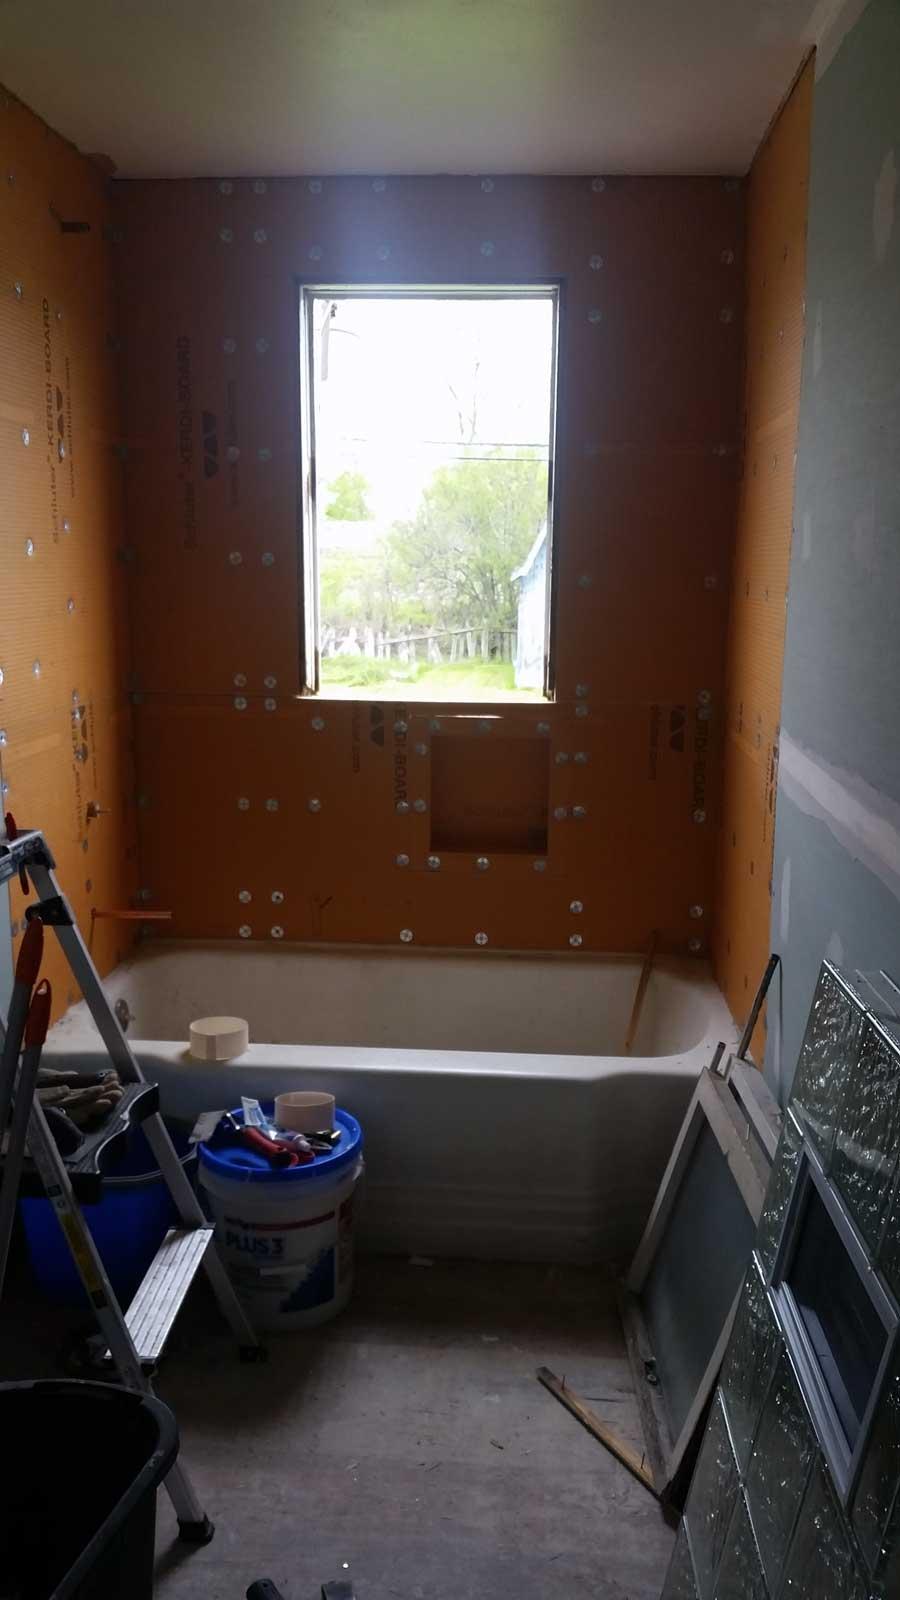 15 Day Bathroom Renovation Plaster 01